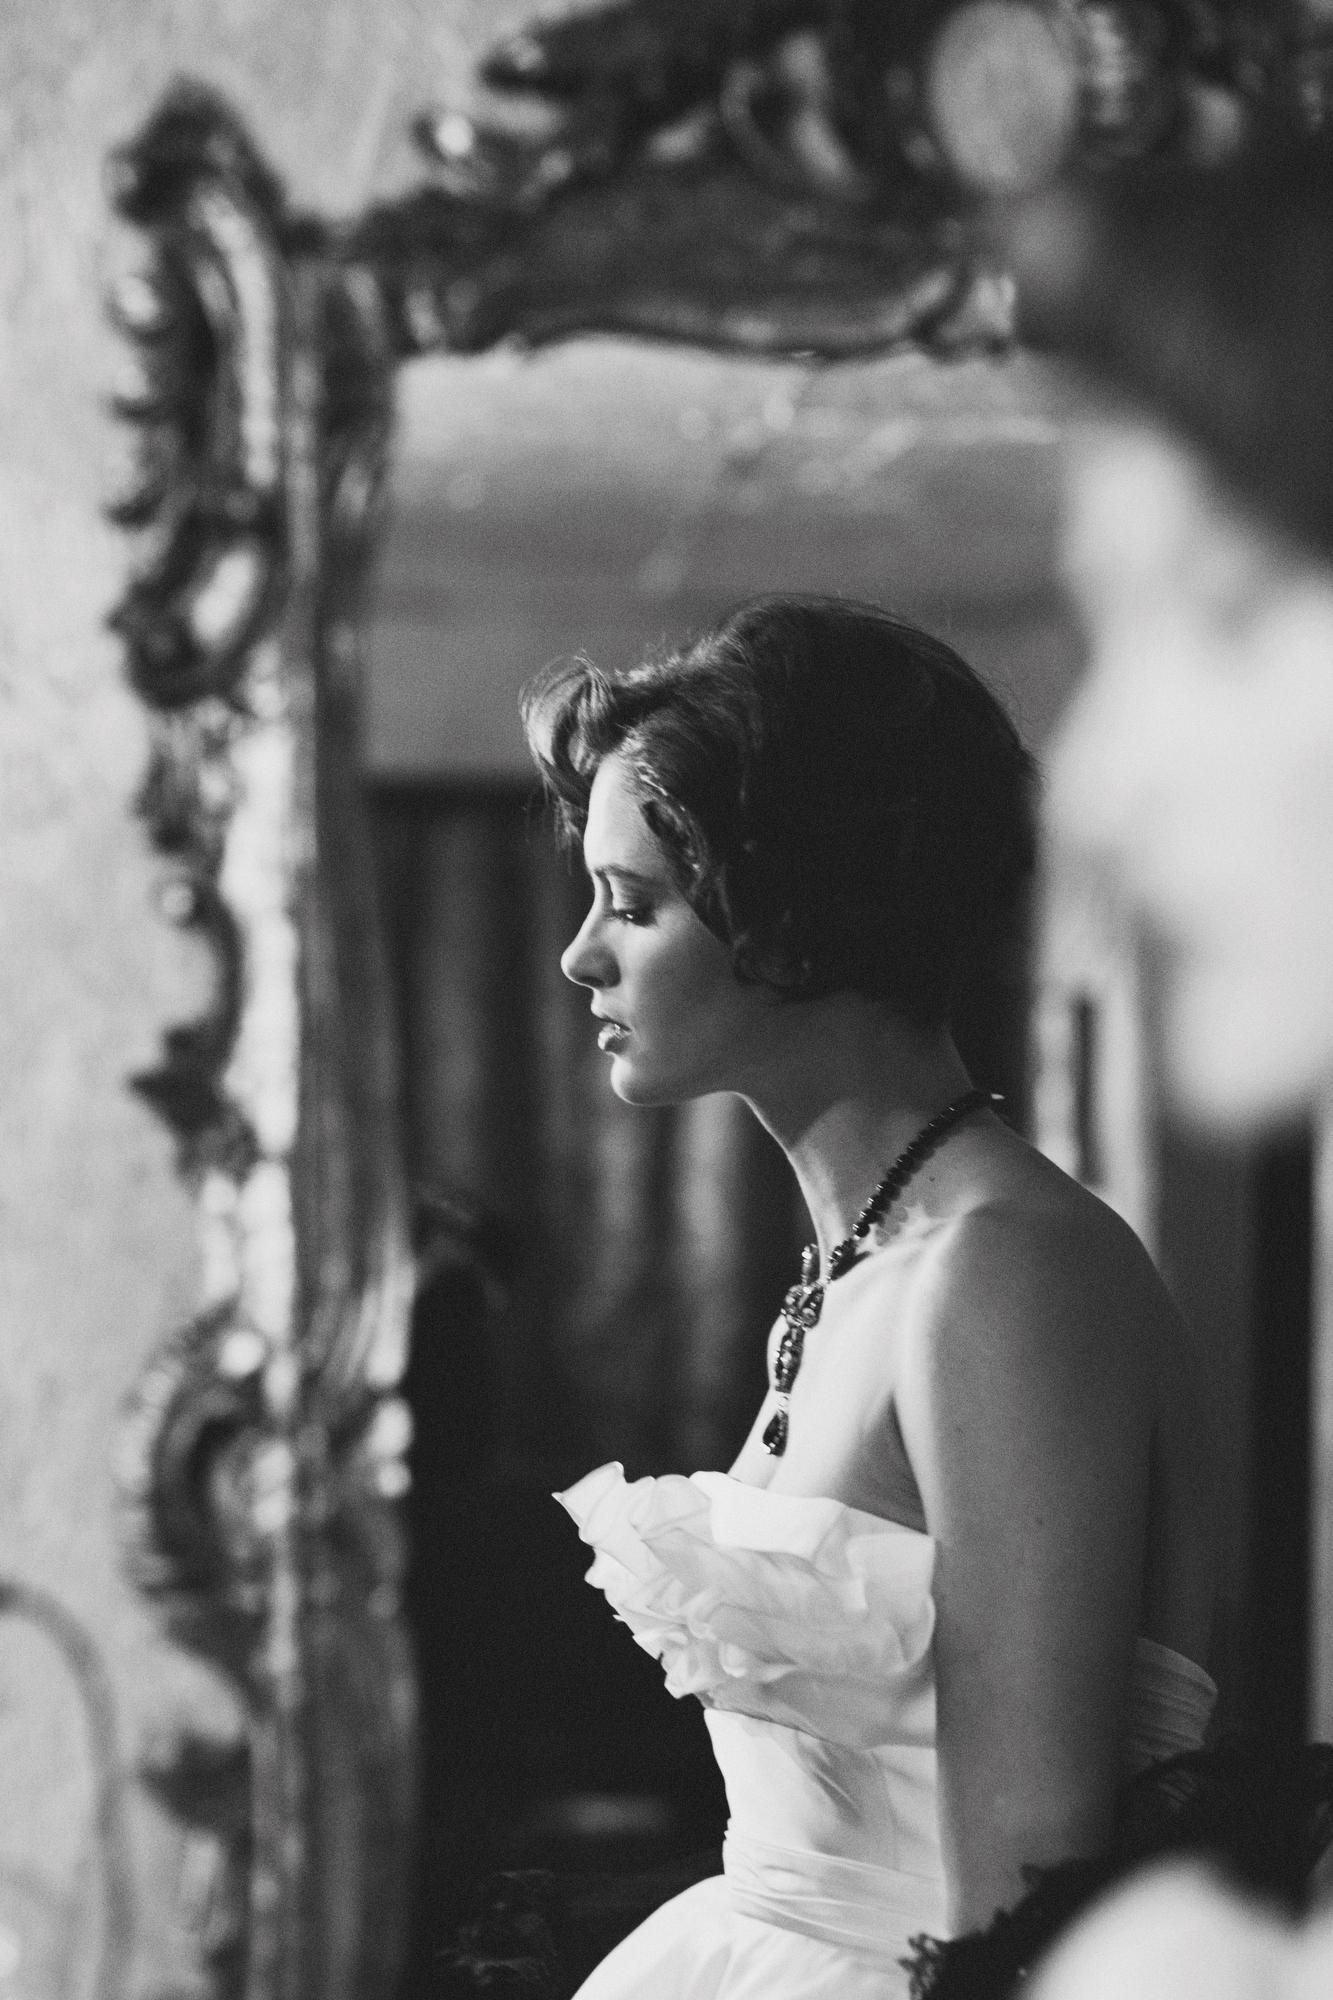 jennifer-skog-bridal-fashion-photographer-lifestyle-0017.jpg